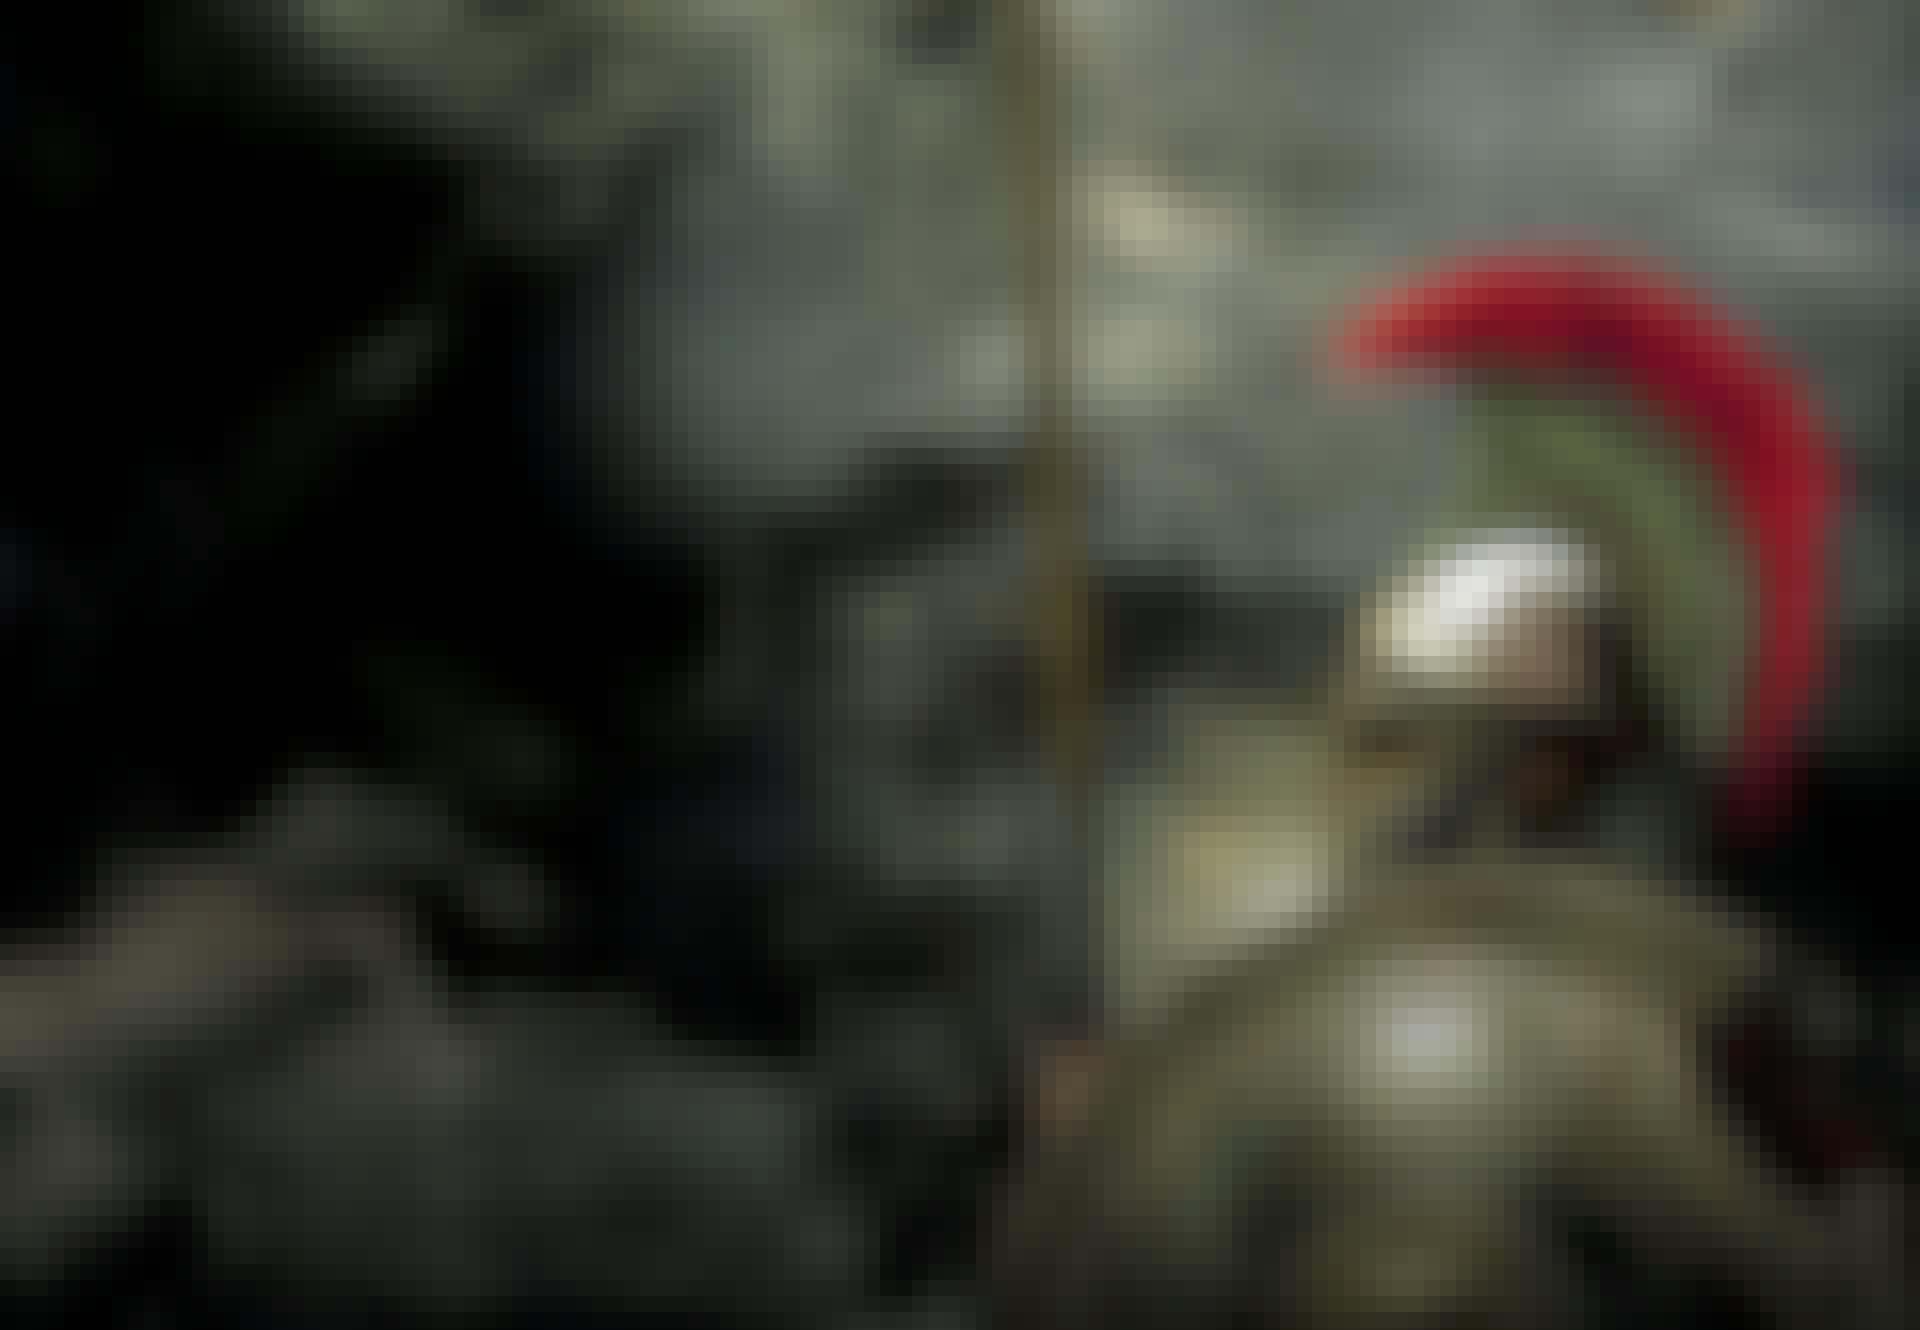 Sparta, antikken, kriger